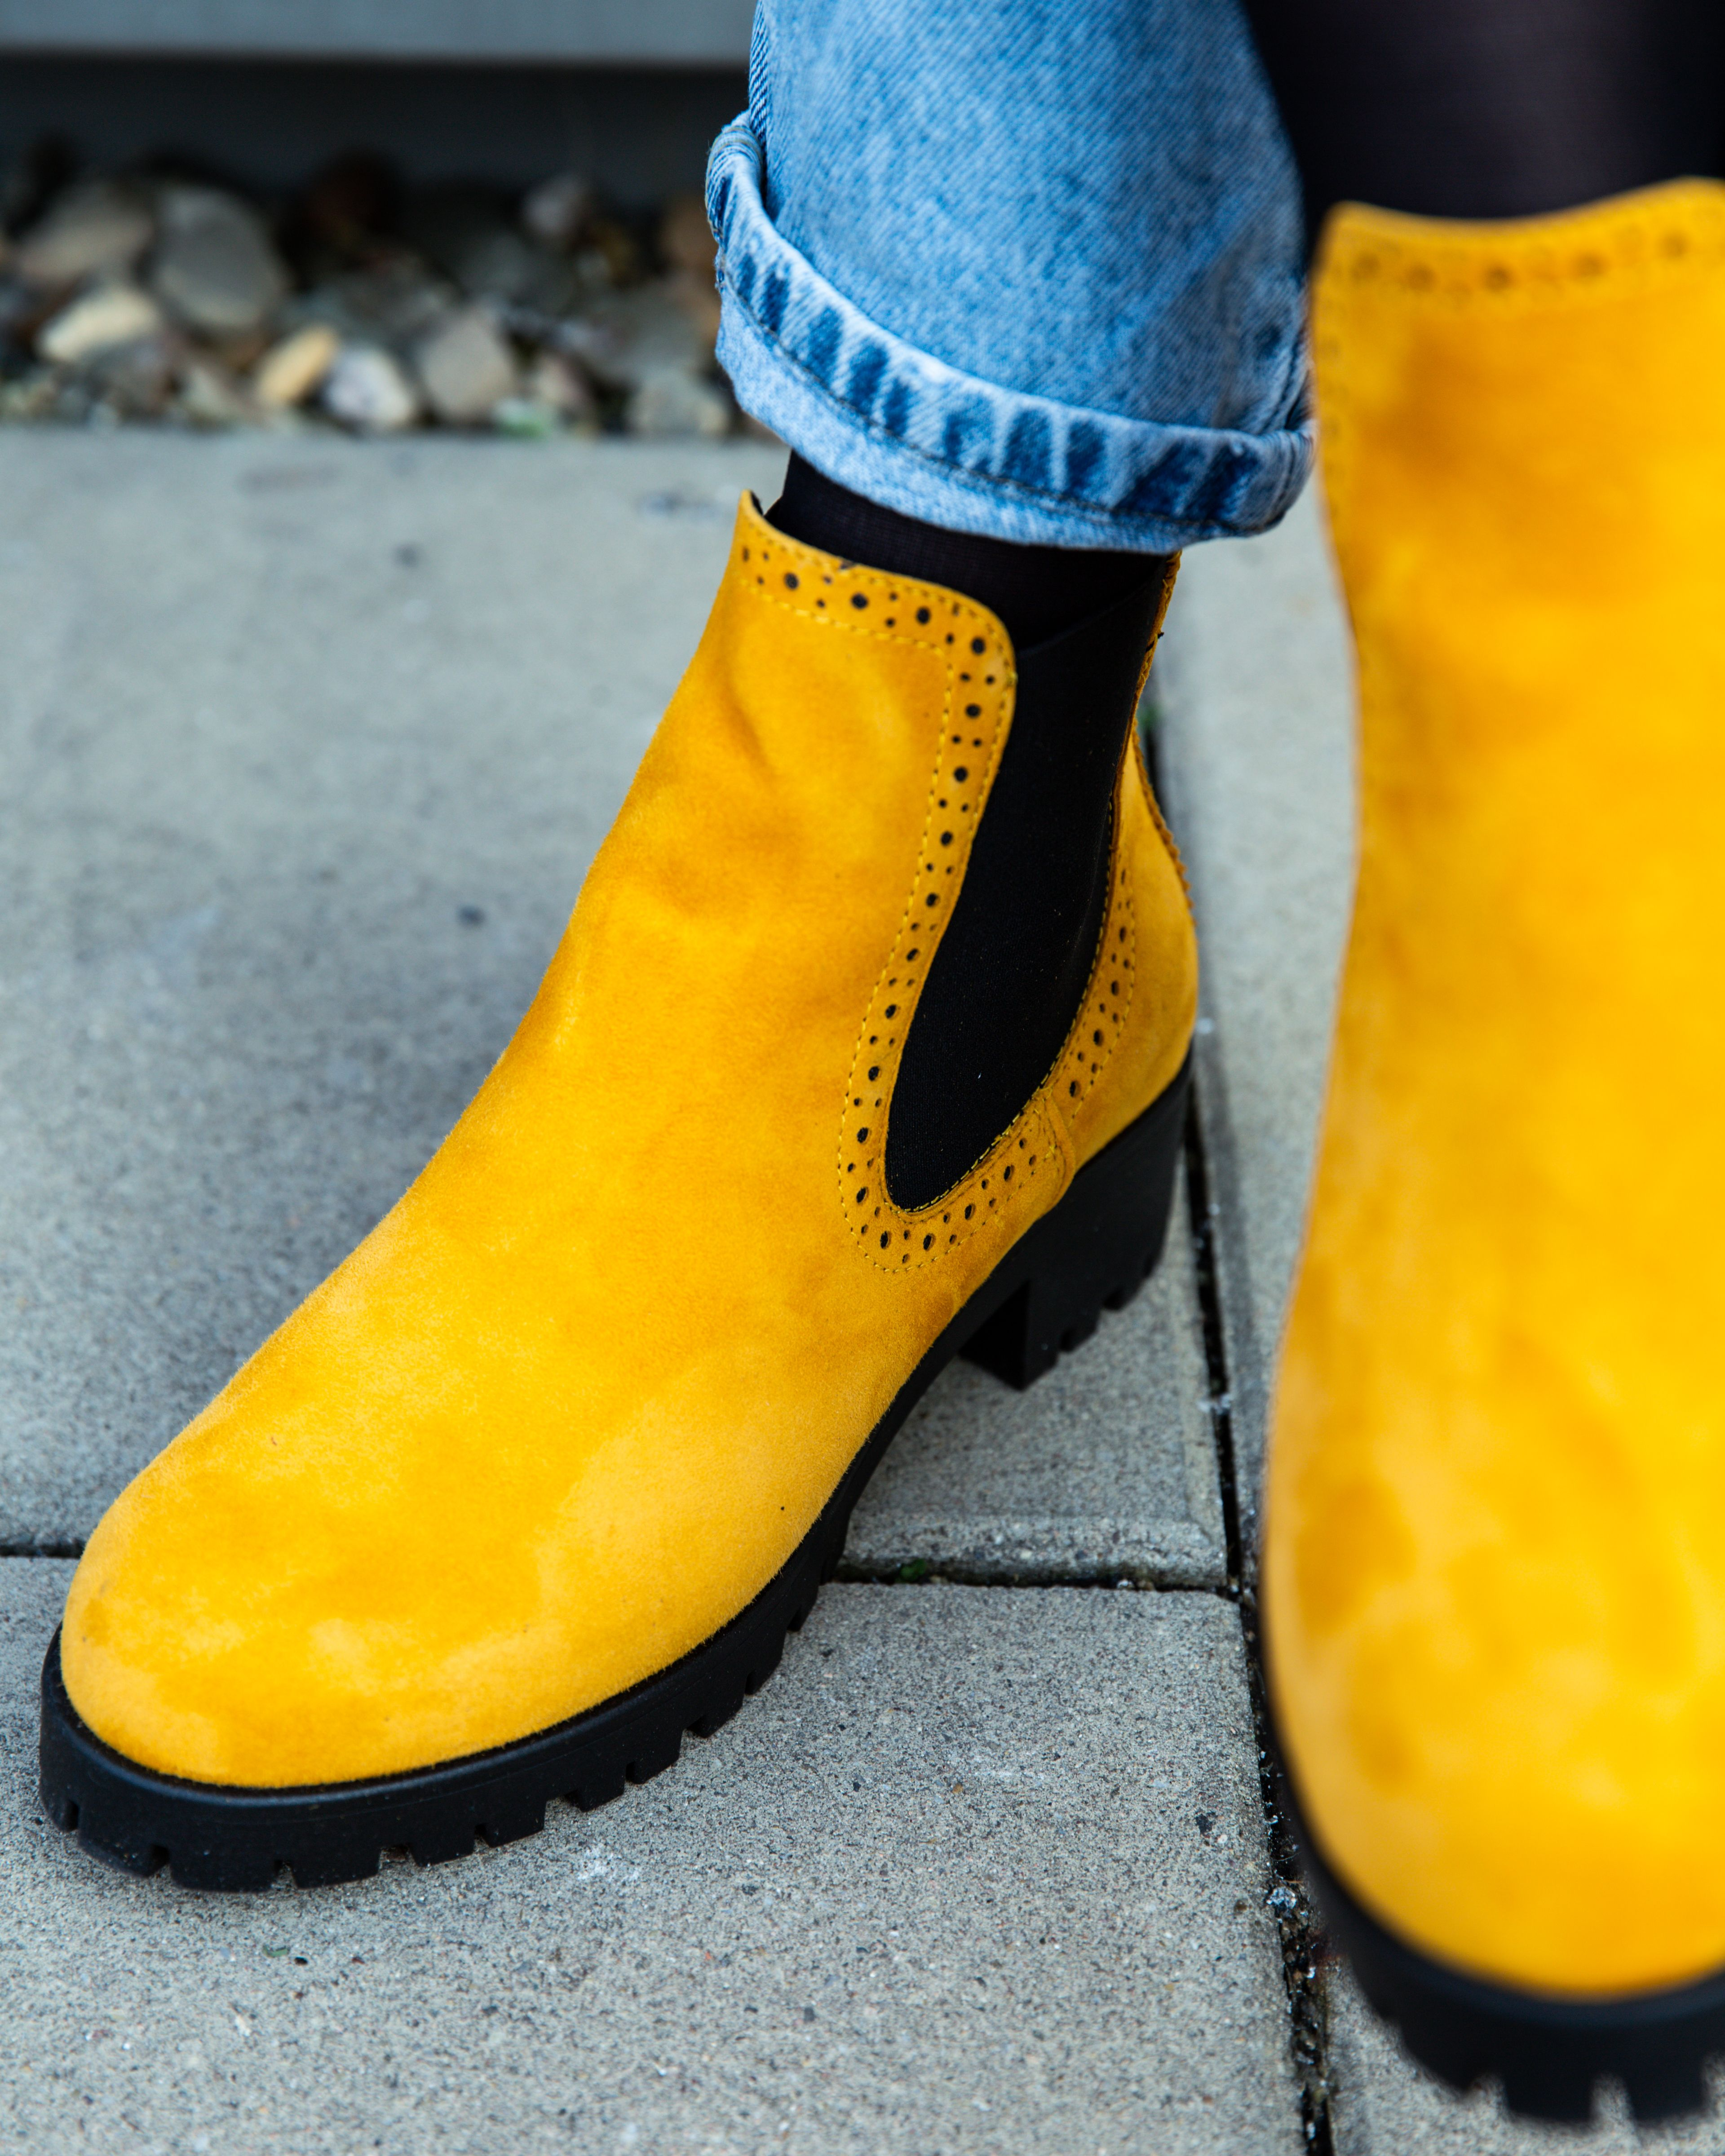 Tamaris Stiefeletten gelb | Winterschuhe damen, Winterschuhe